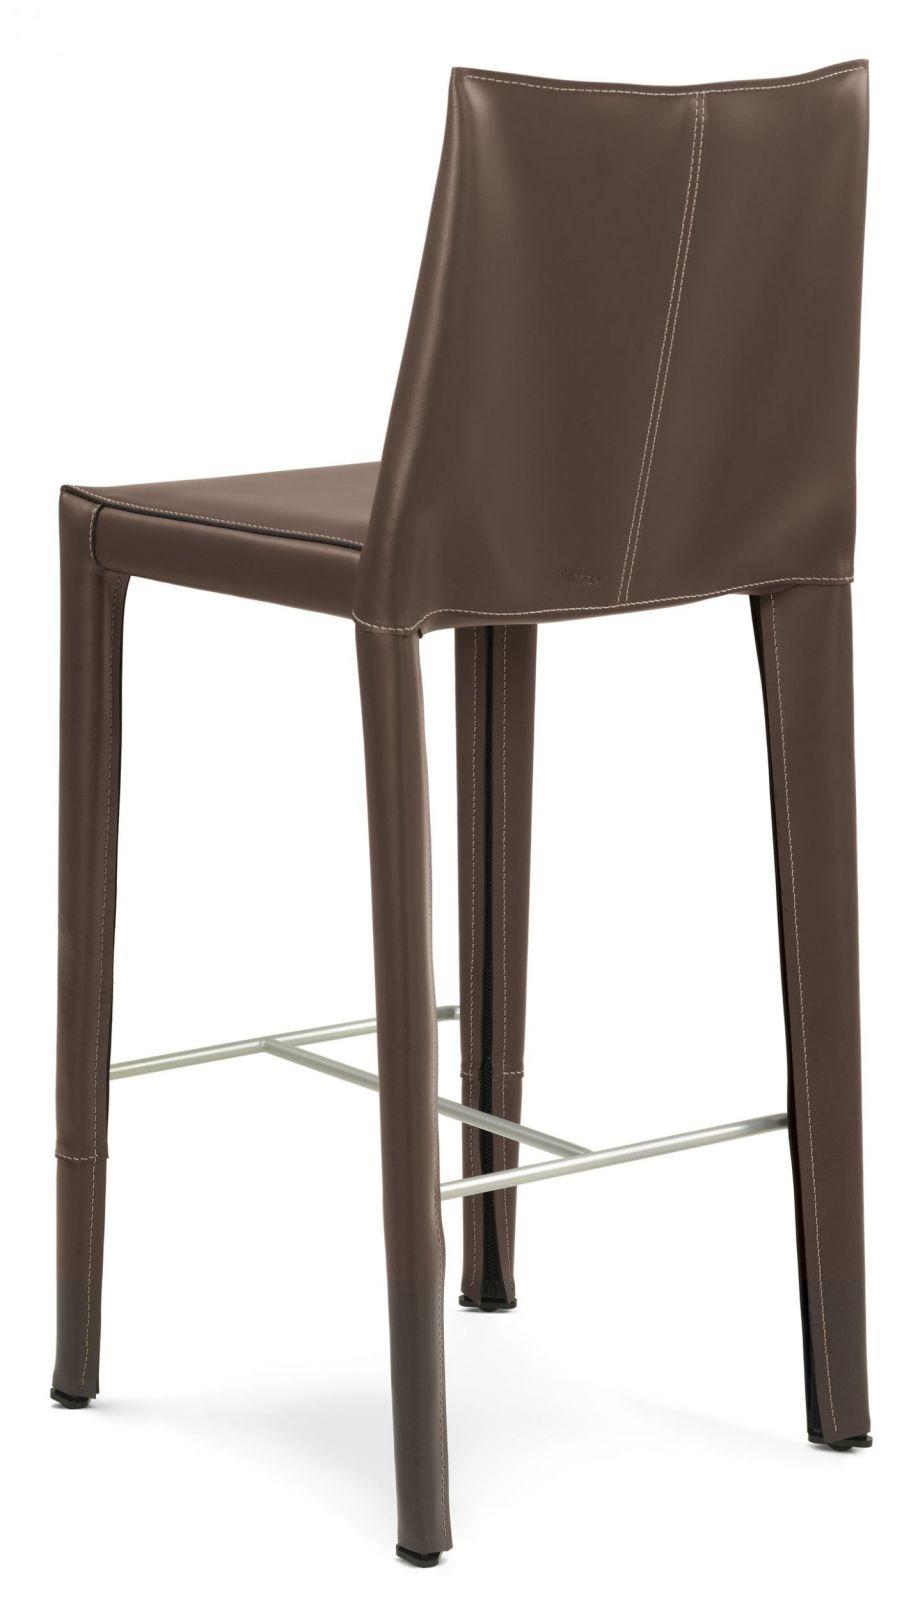 modern-bar-stools-Italian-furniture-large (14).jpg